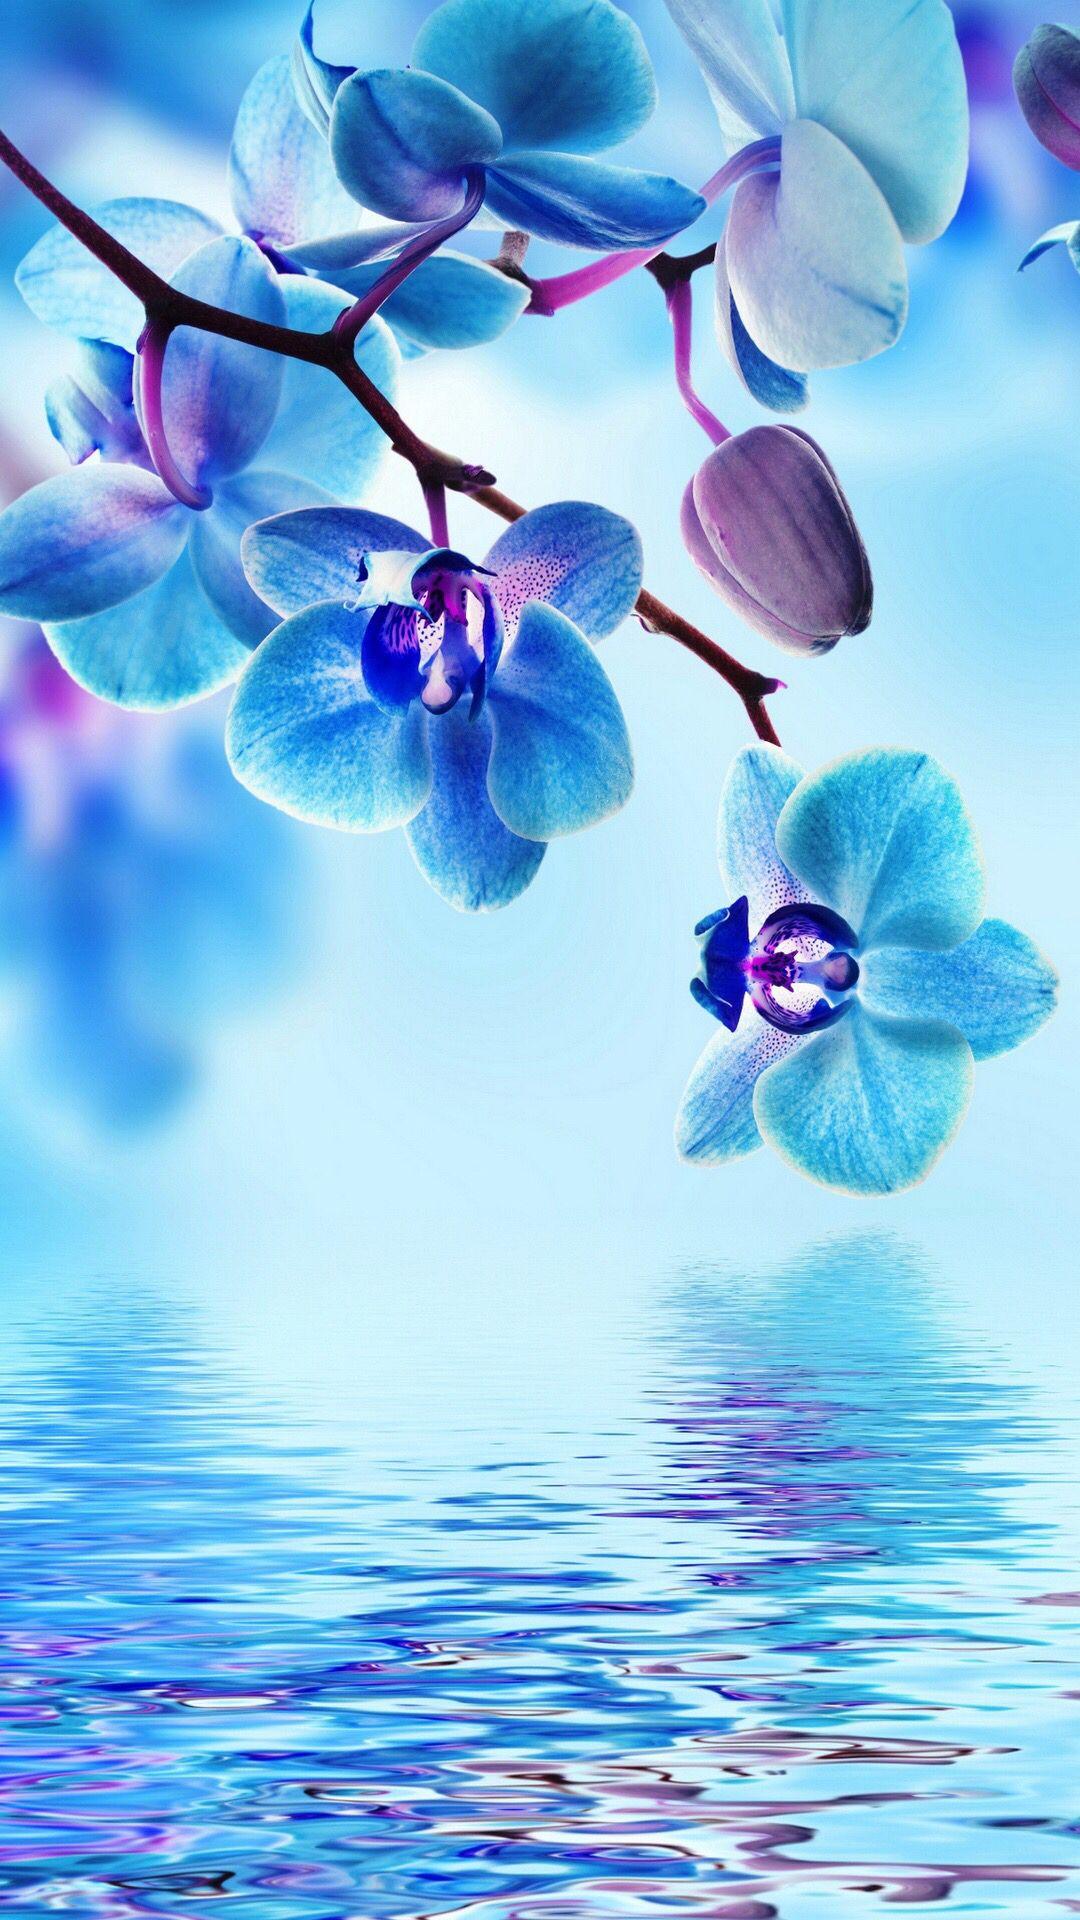 Blue Water Wallpaper Beautiful Wallpapers Backgrounds Orchid Wallpaper Beautiful Flowers Wallpapers